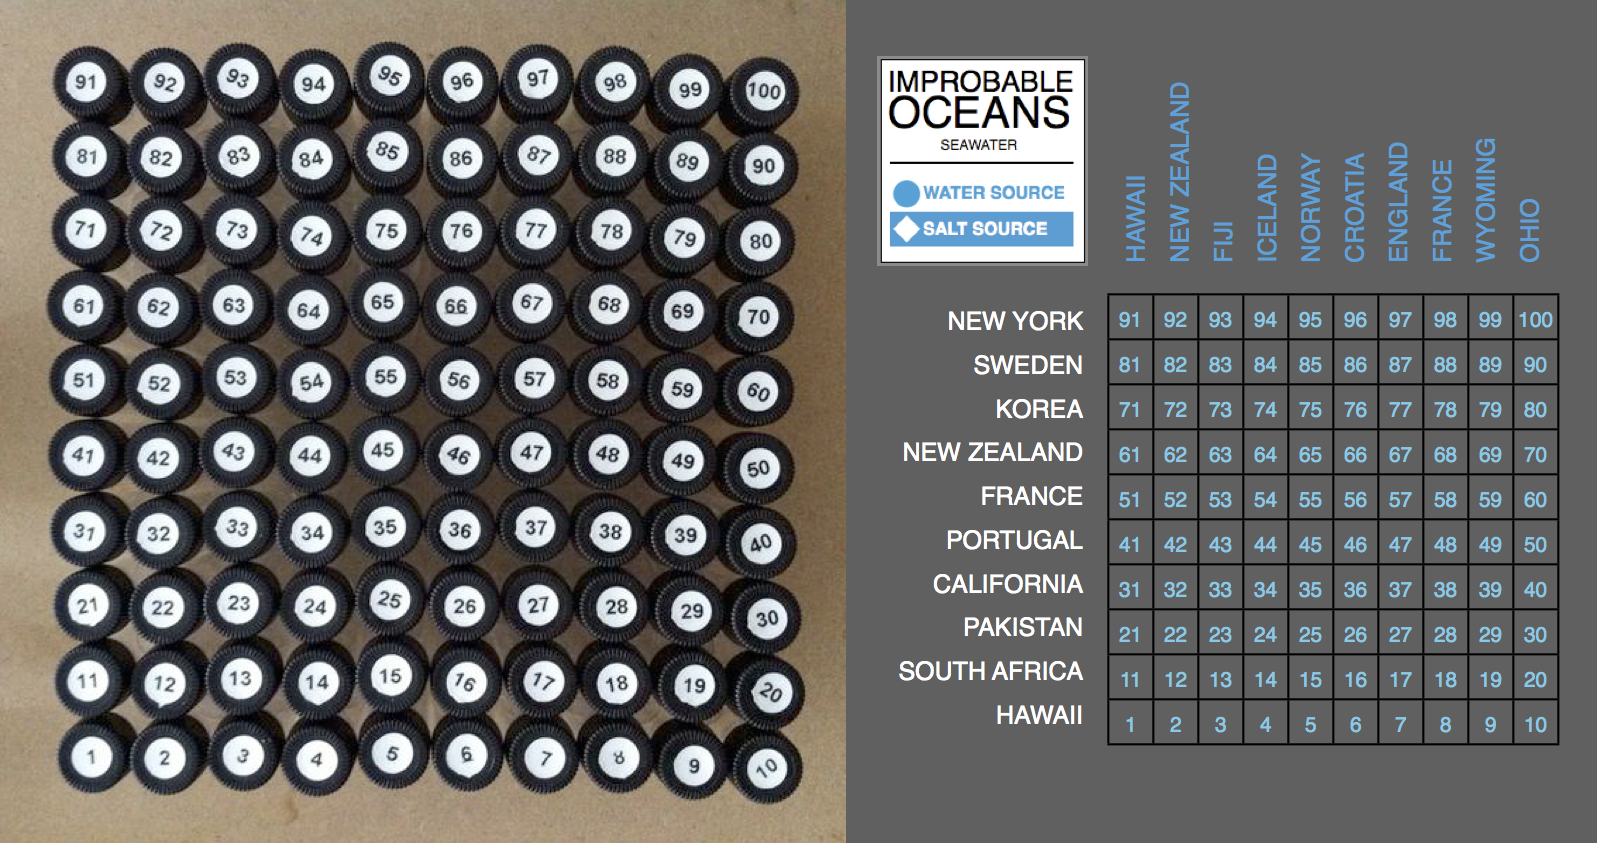 IMPROBABLE OCEANS - 100 VIALS OF SUPPLY CHAIN BRINES (2015).jpg